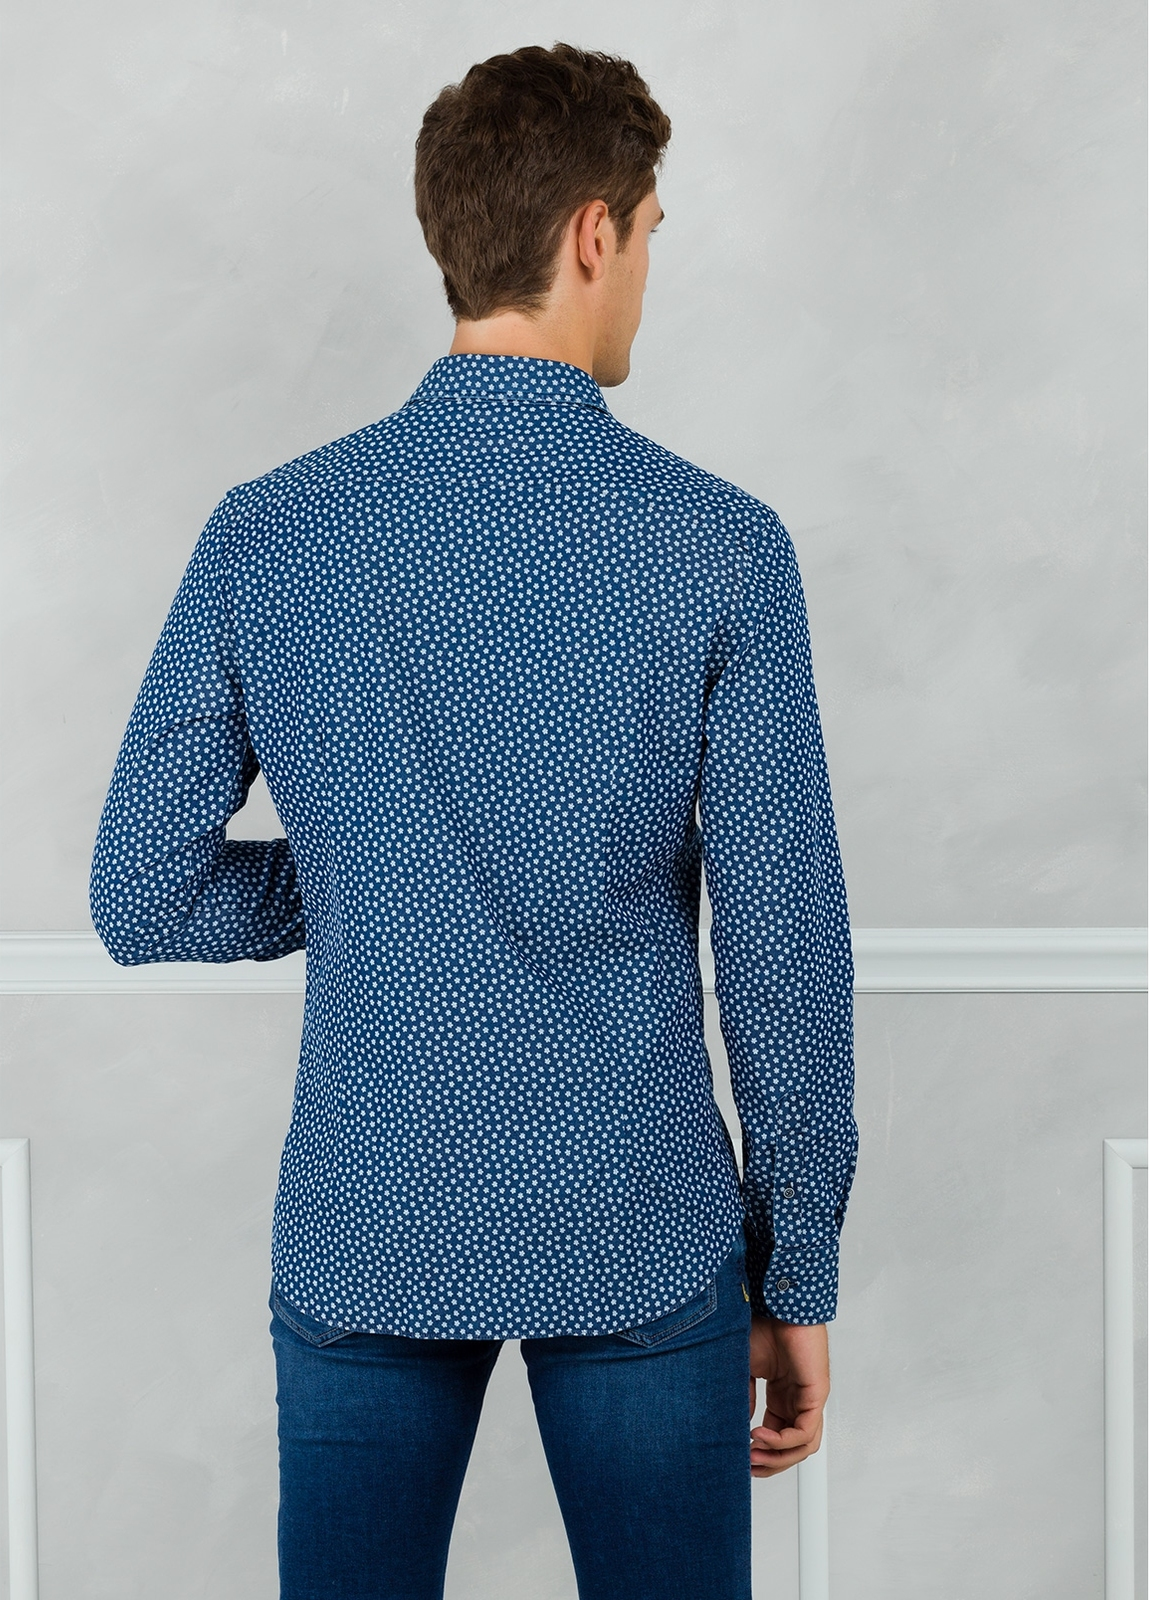 Camisa Leisure Wear SLIM FIT modelo PORTO dibujo floral, color azul. 100% Algodón. - Ítem2